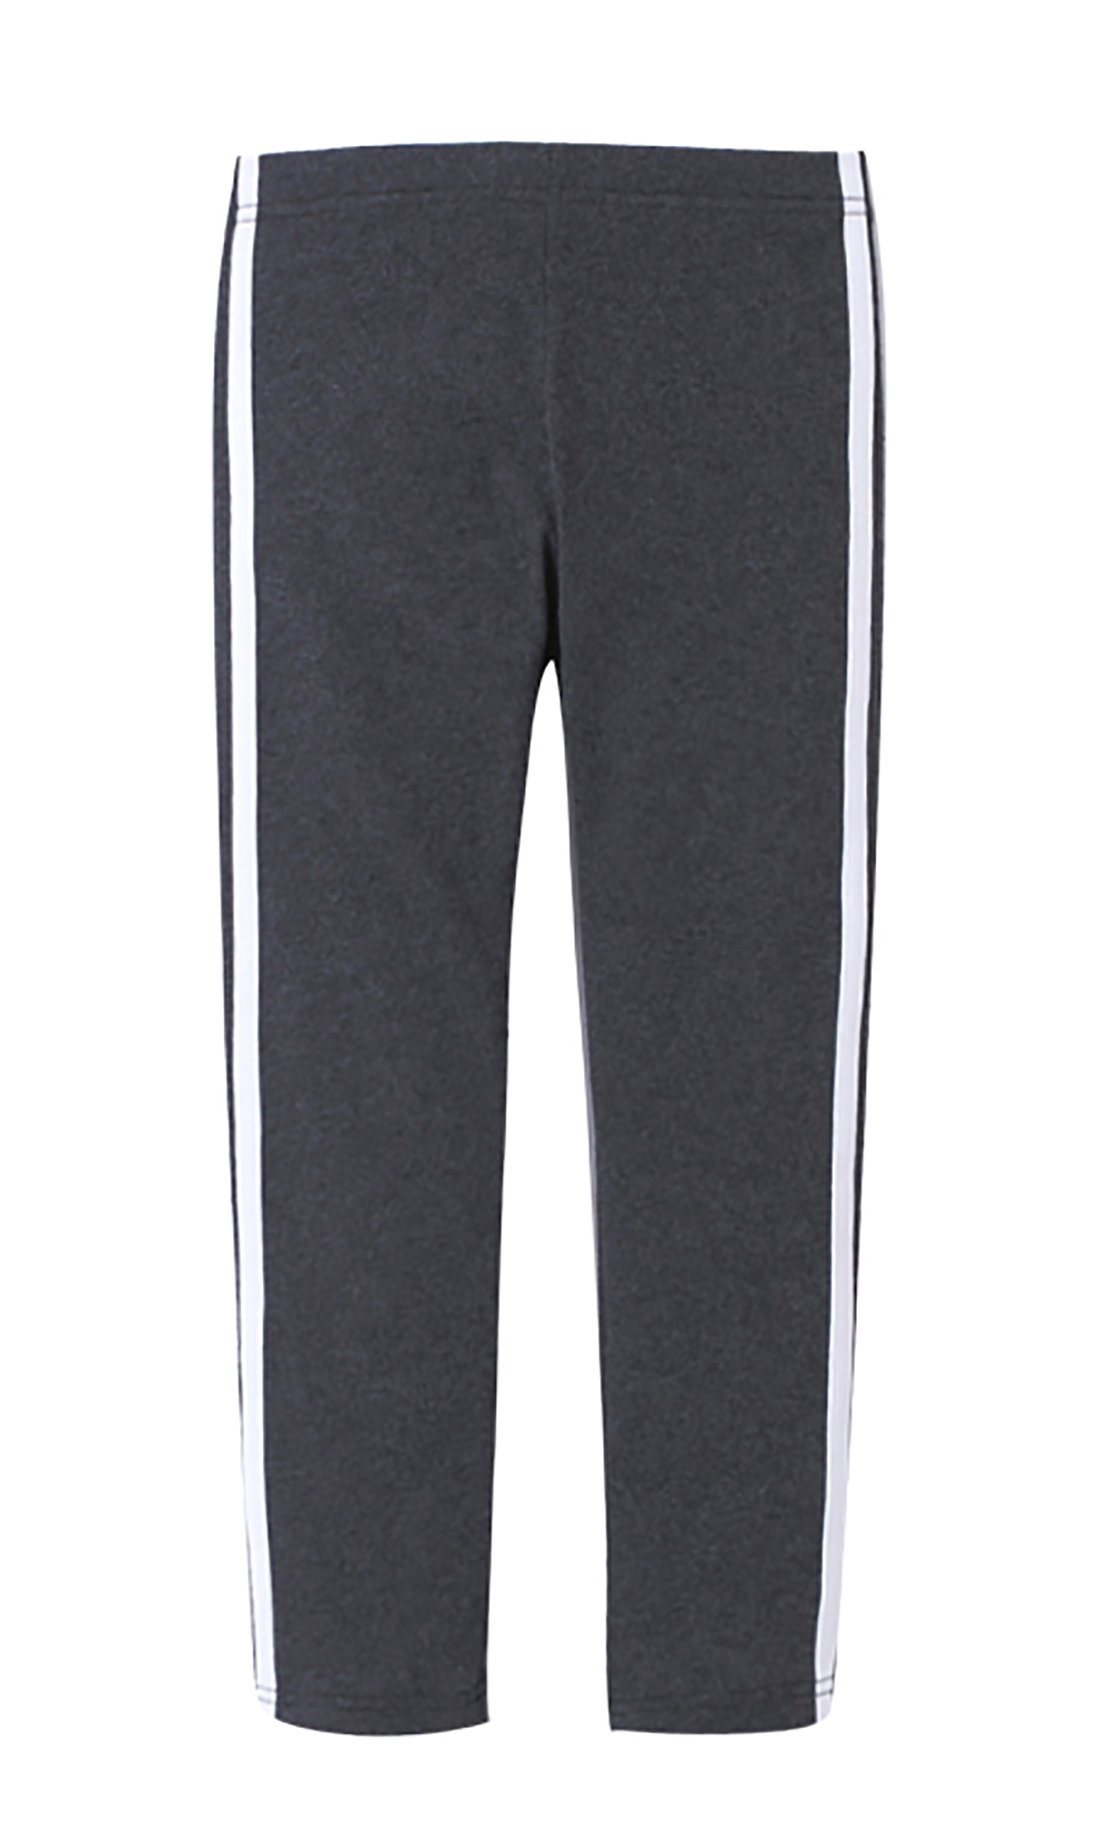 Zegoo Girl's Workout Exercise Elastic Waist Ankle Jogger Sweatpants Black